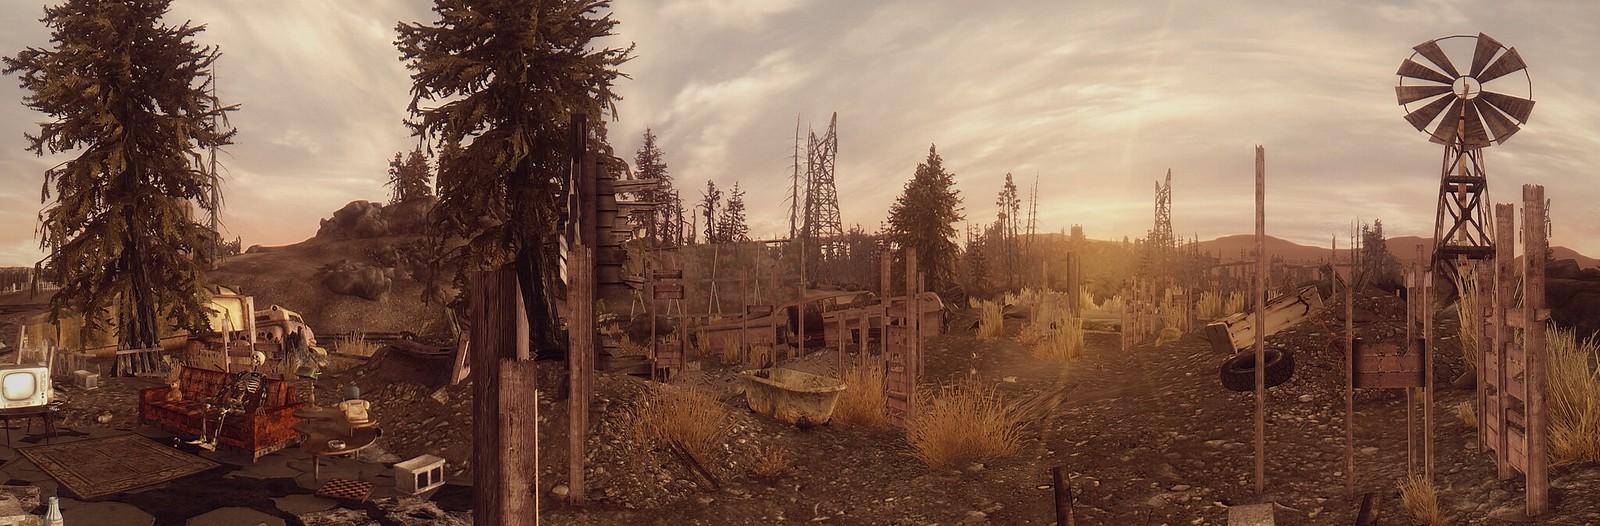 Fallout Screenshots XIII - Page 7 43592966244_a972b2ffe5_h